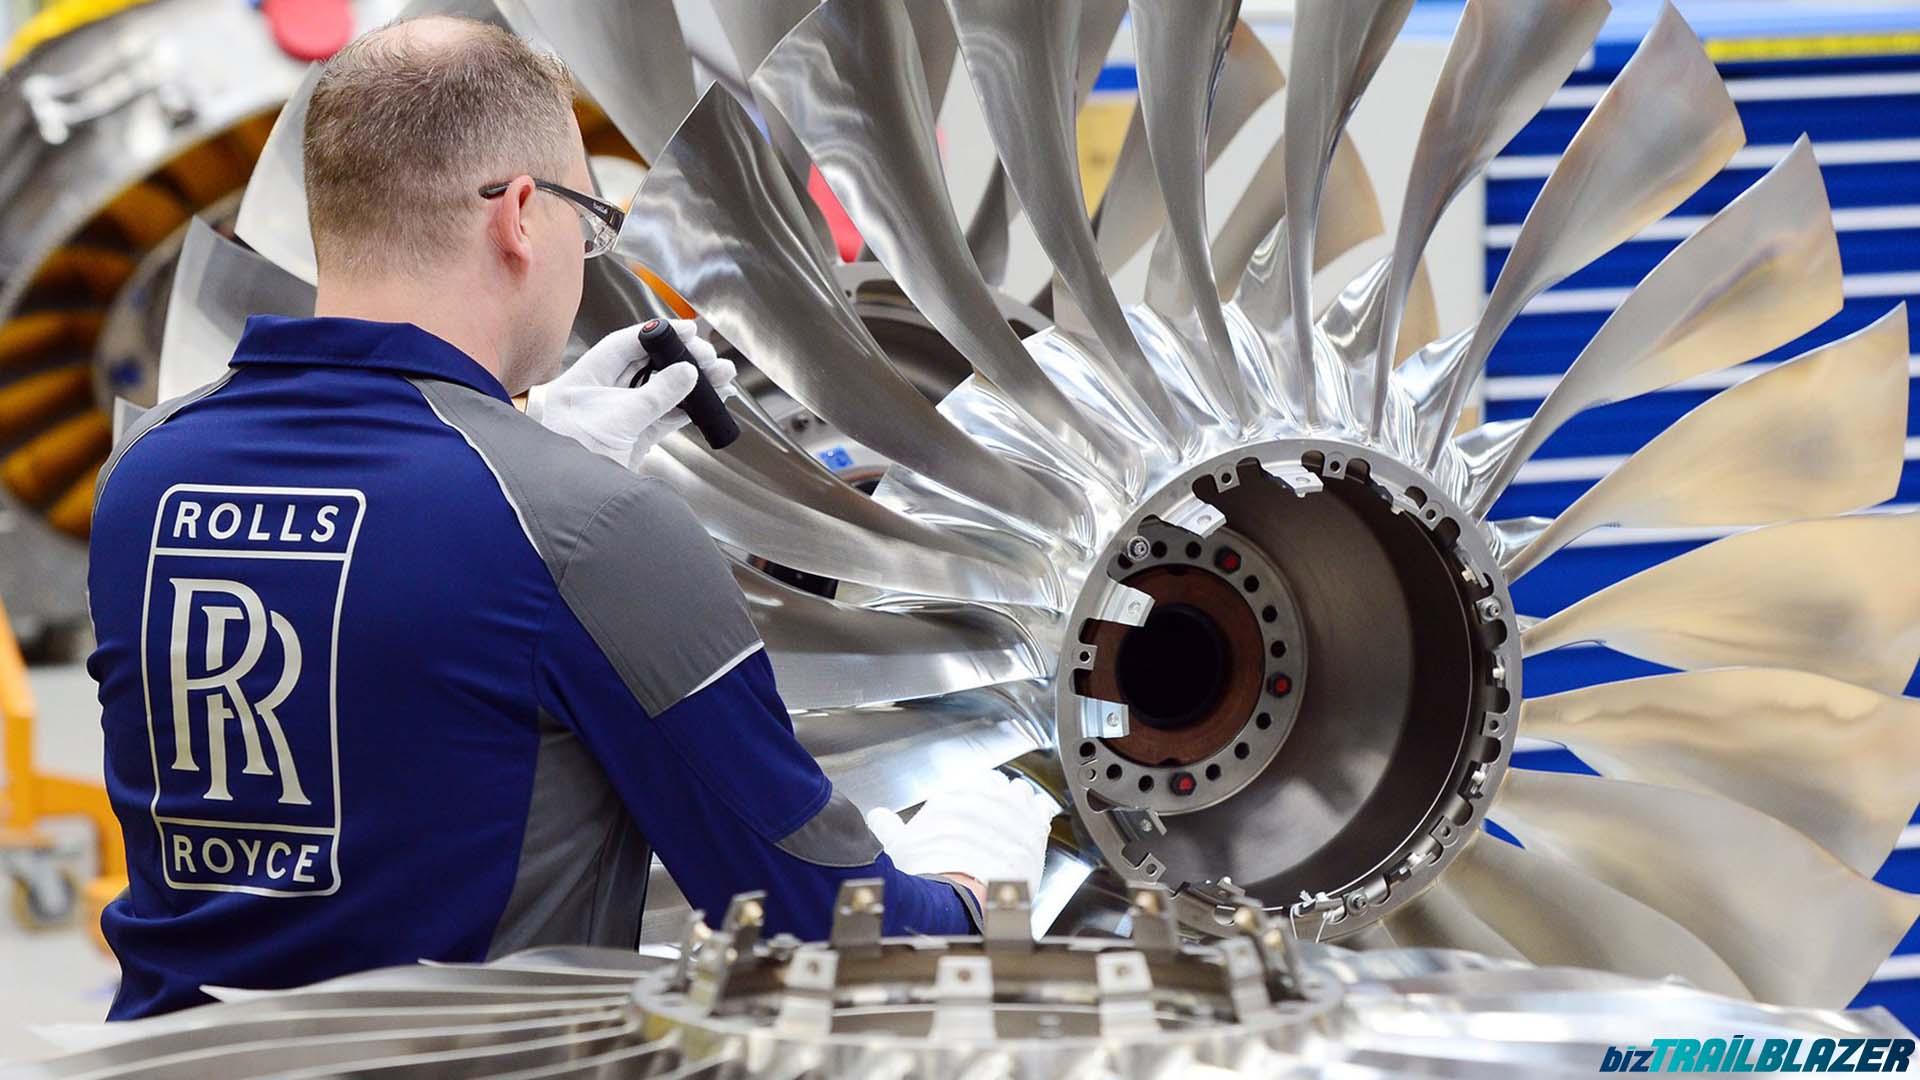 BizTrailBlazer-Blog-Rolls-Royce-Shares-Hit-a-New-Low-Due-to-3-billion-Equity-Raise